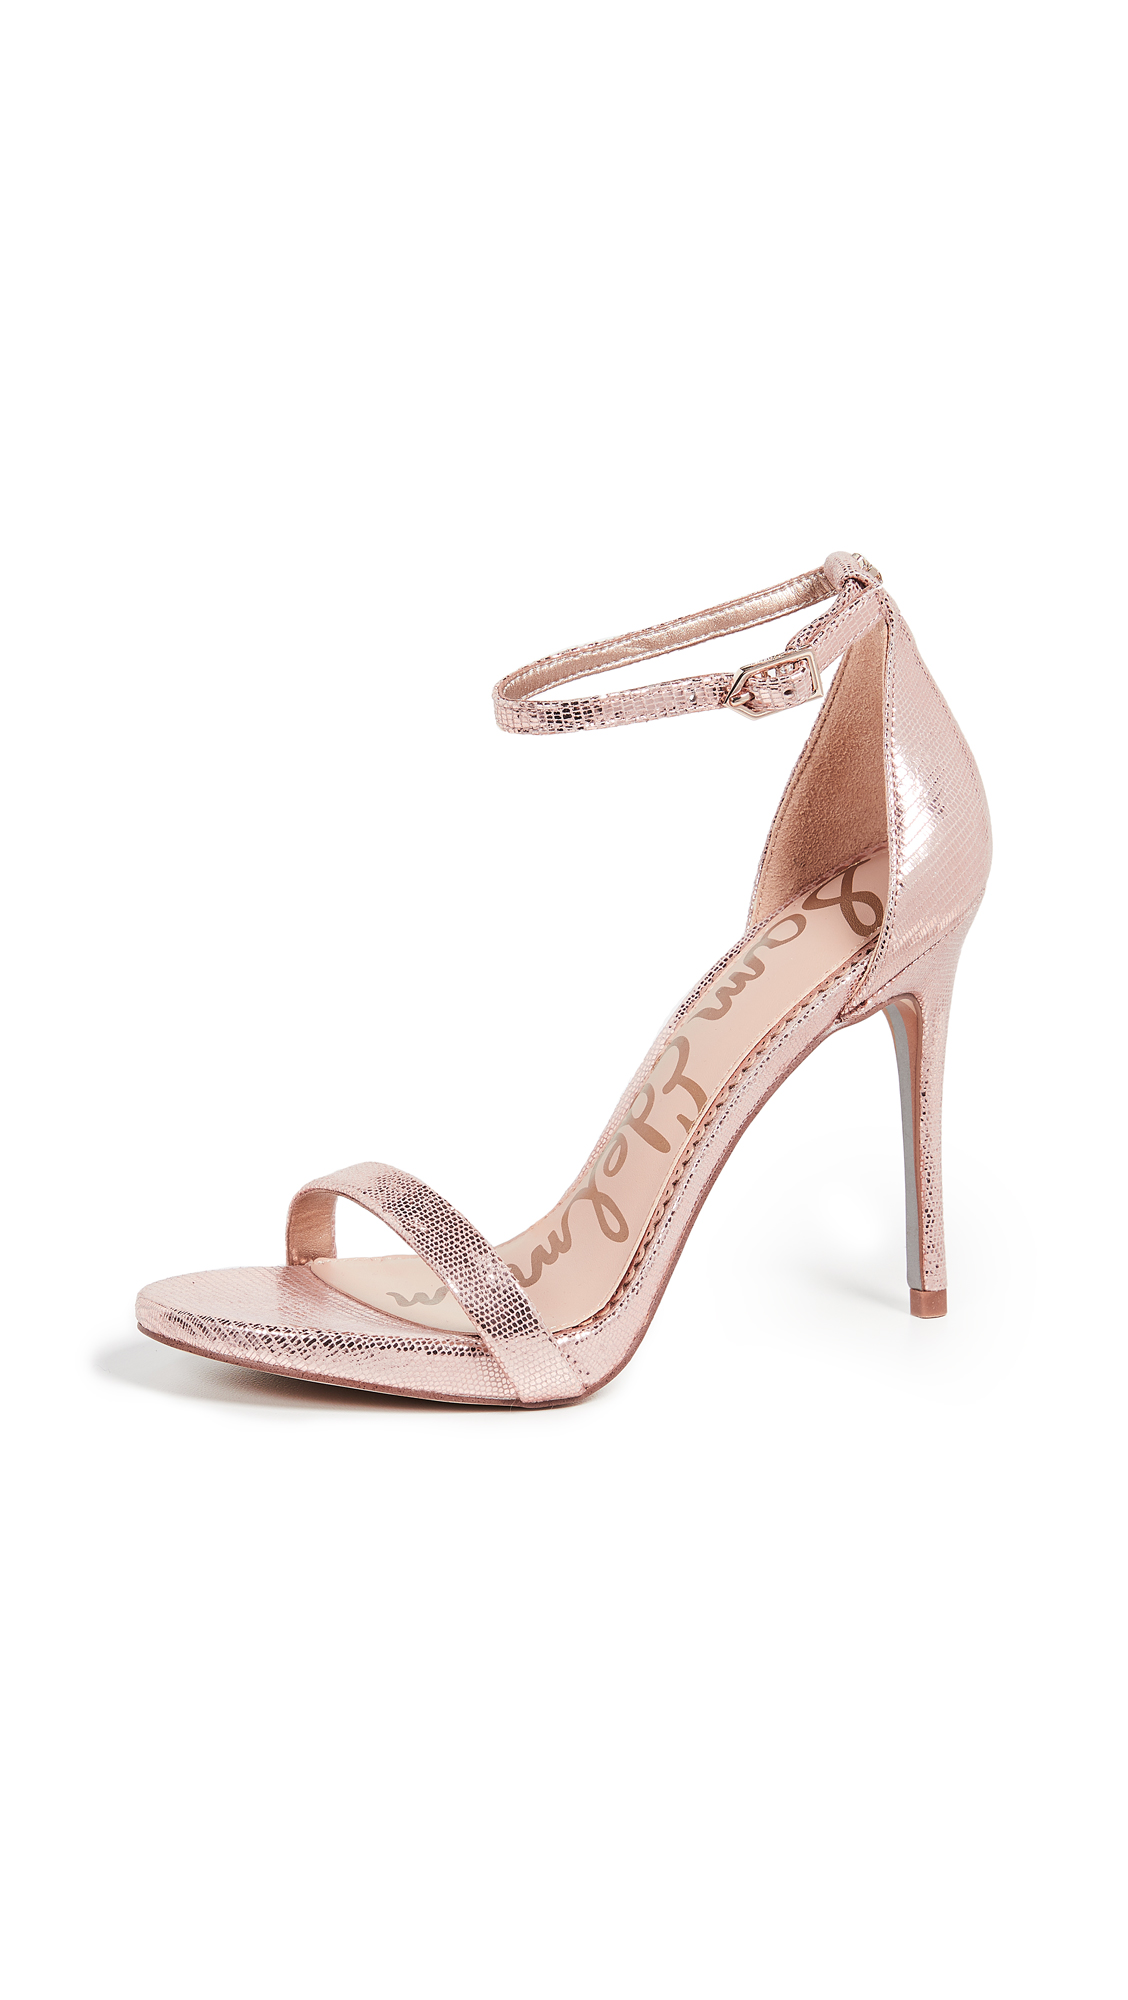 9bf63ea05986 Sam Edelman Women s Ariella High-Heel Ankle Strap Sandals In Blush Gold